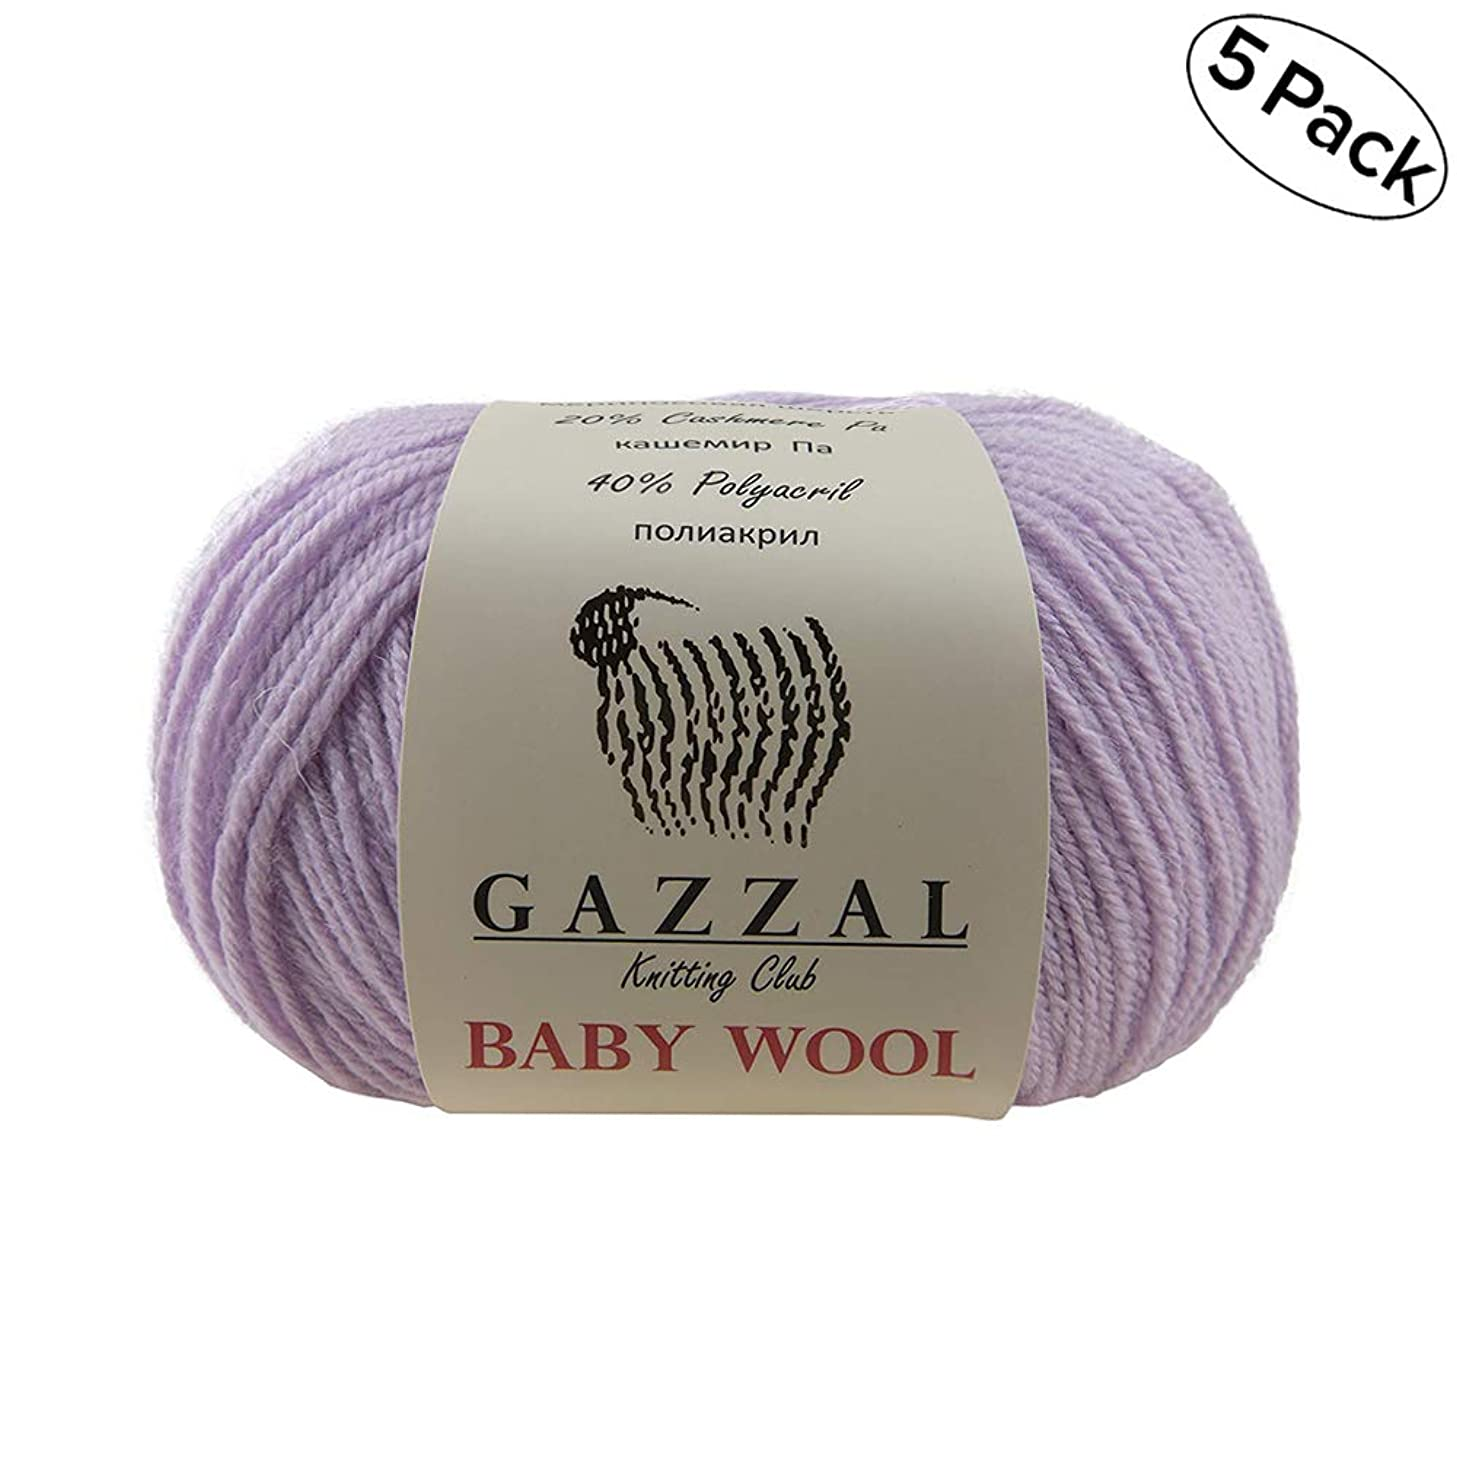 5 PACK - Gazzal Baby Wool 1.76 Oz (50g)/218 Yards (200m) Fine Baby Yarn, 40% Lana Merino, 20% Cashmere Type Polyamide; (Lilac Purple - 823)